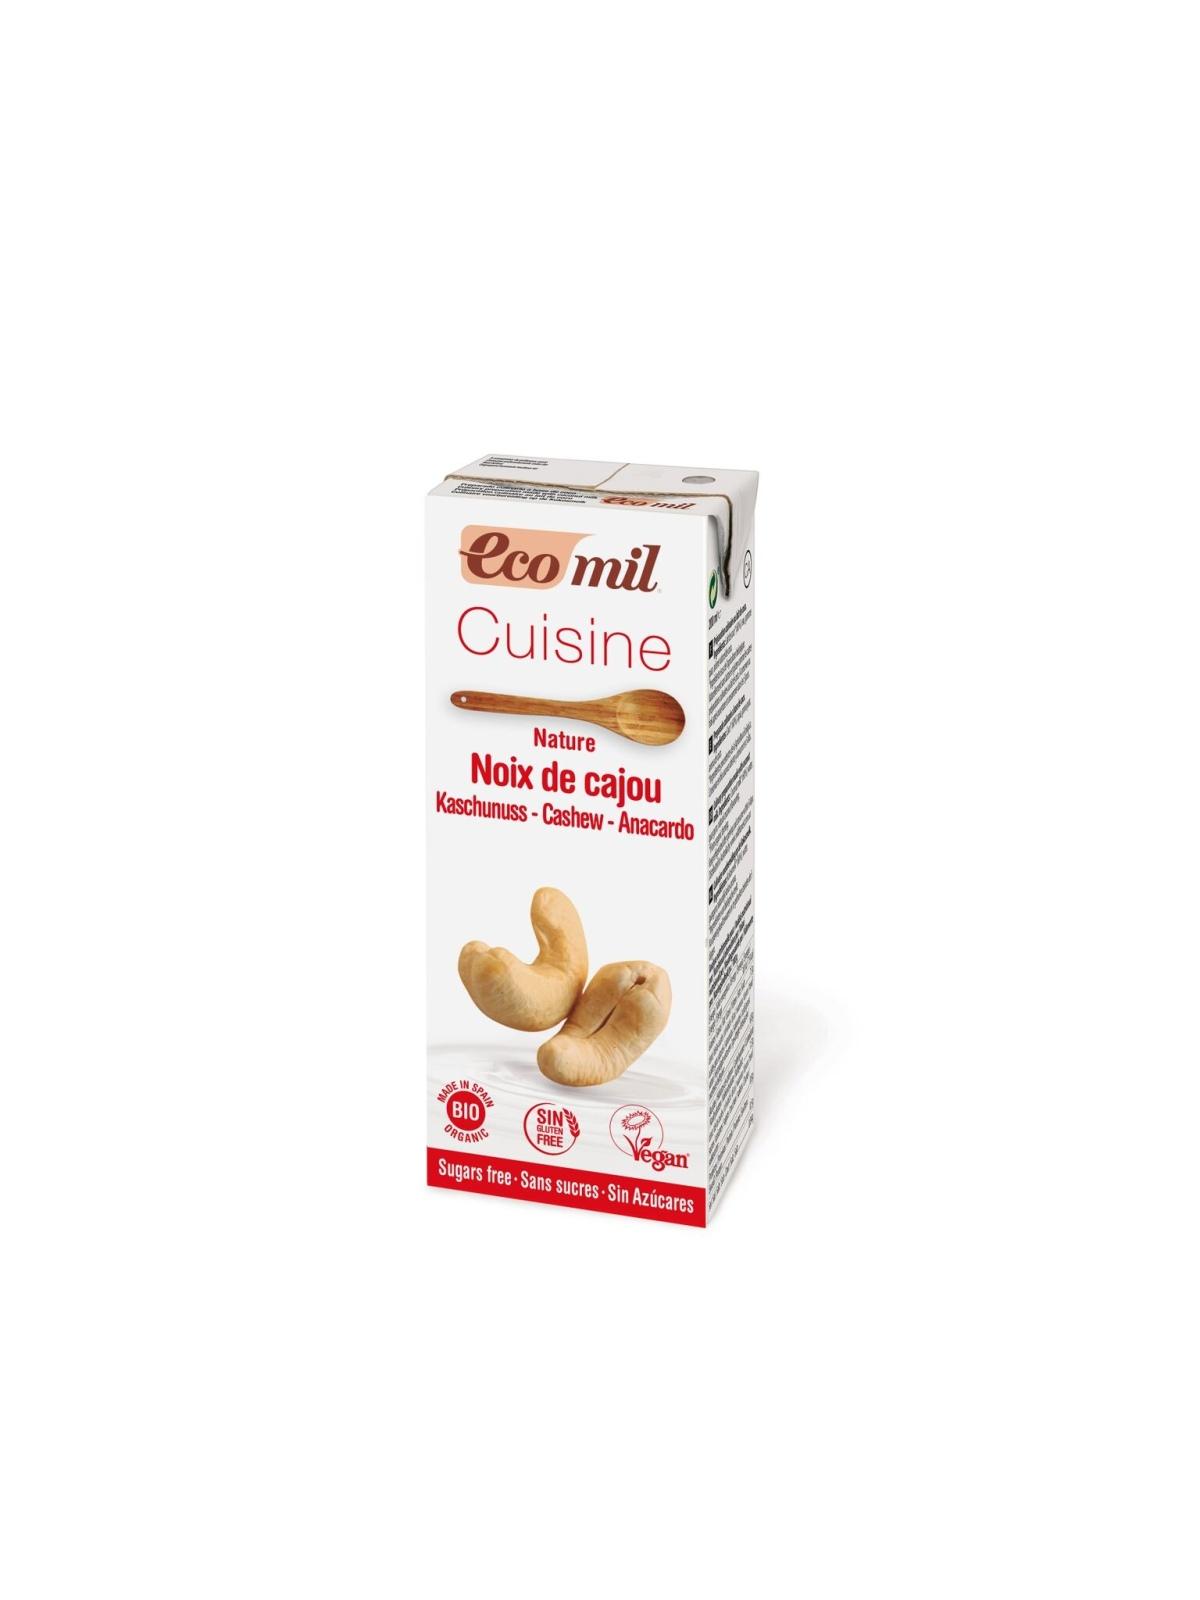 Tetra Brik de Cuisine Anacardo Bio Ecomil 200 ml.